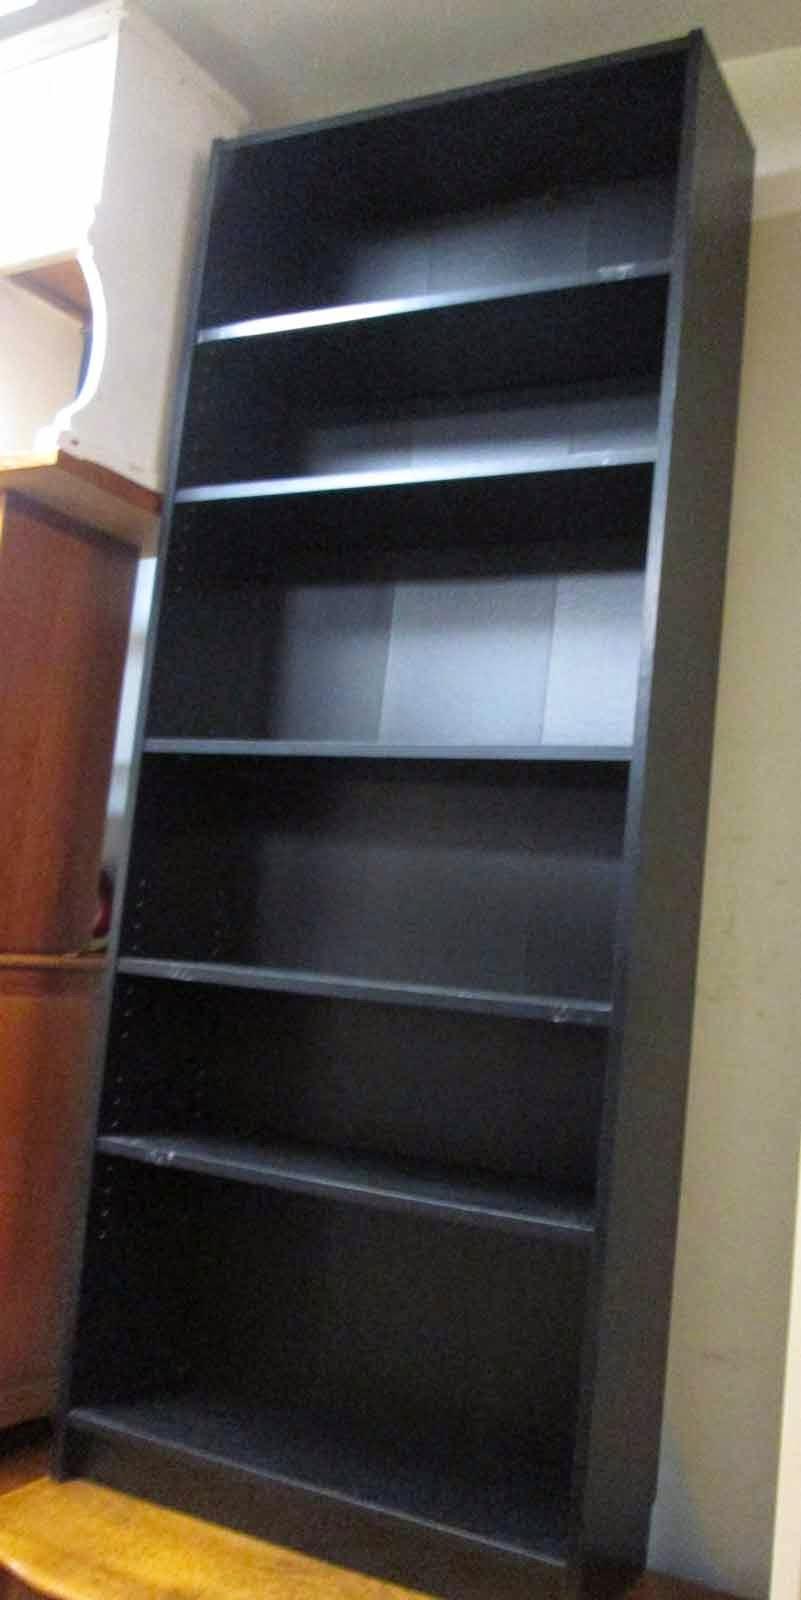 UHURU FURNITURE & COLLECTIBLES: SOLD Tall Black Bookcase - $25